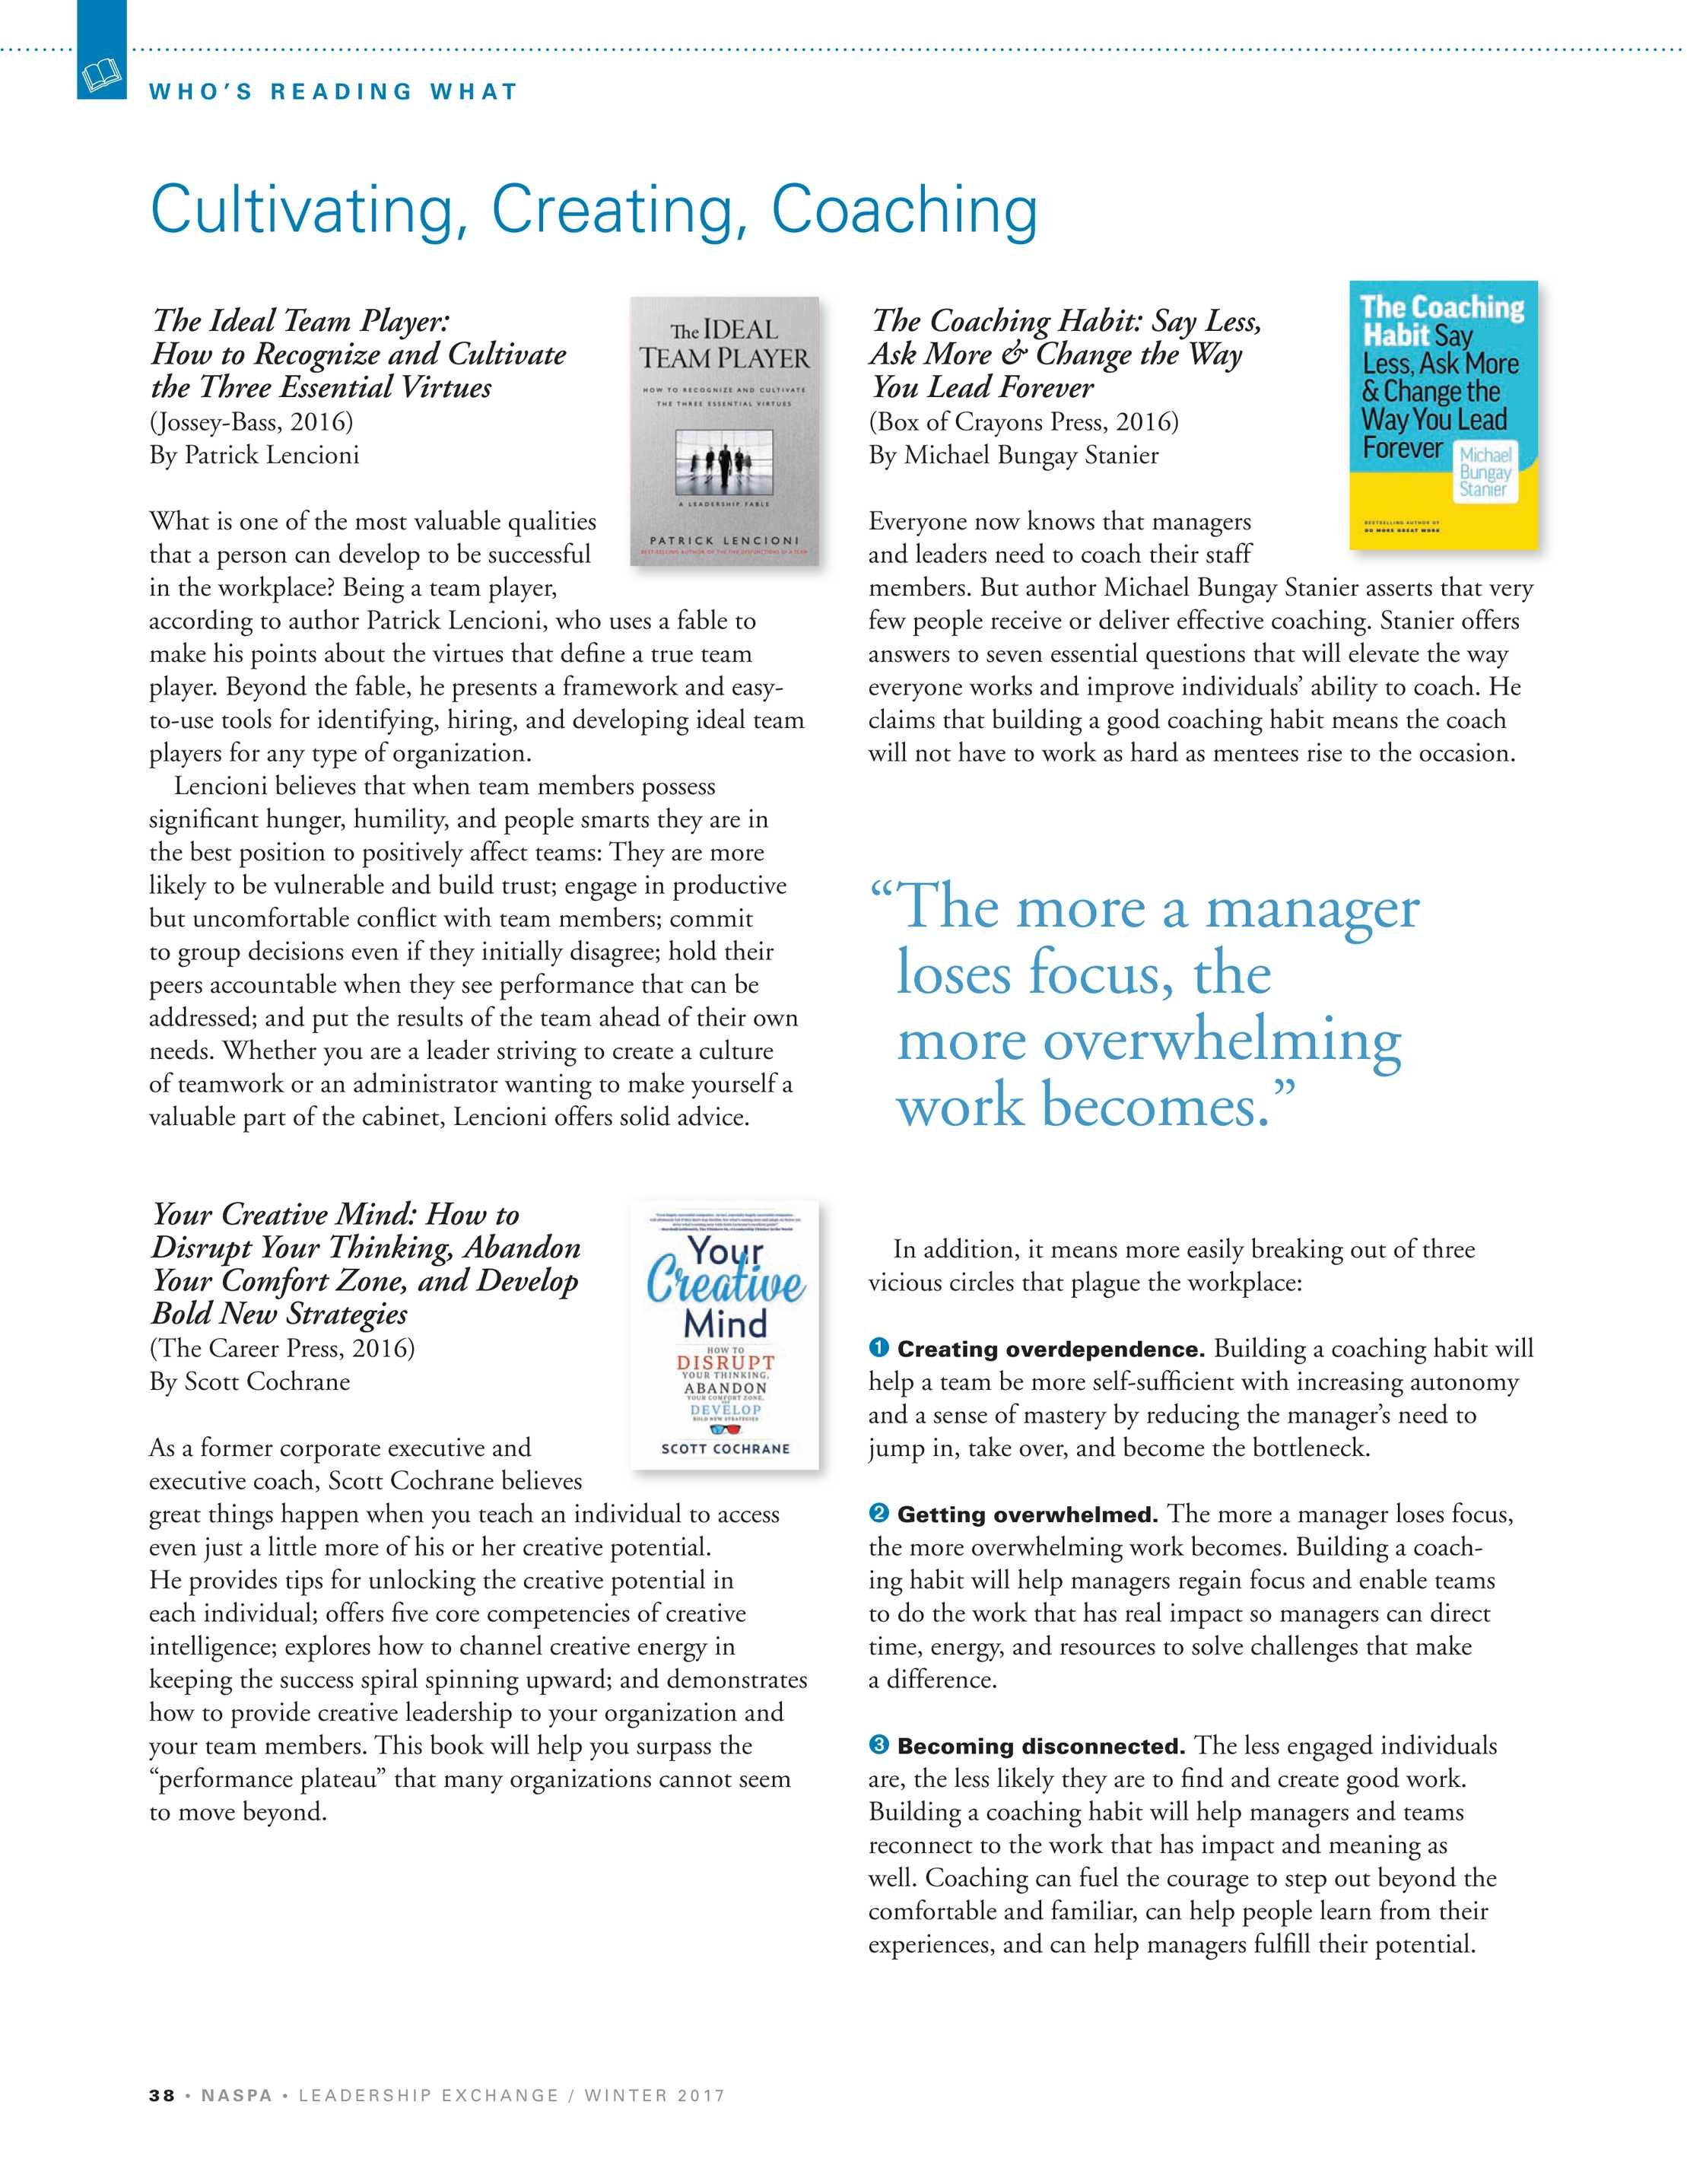 Leadership Exchange - Winter 2017 - page 38